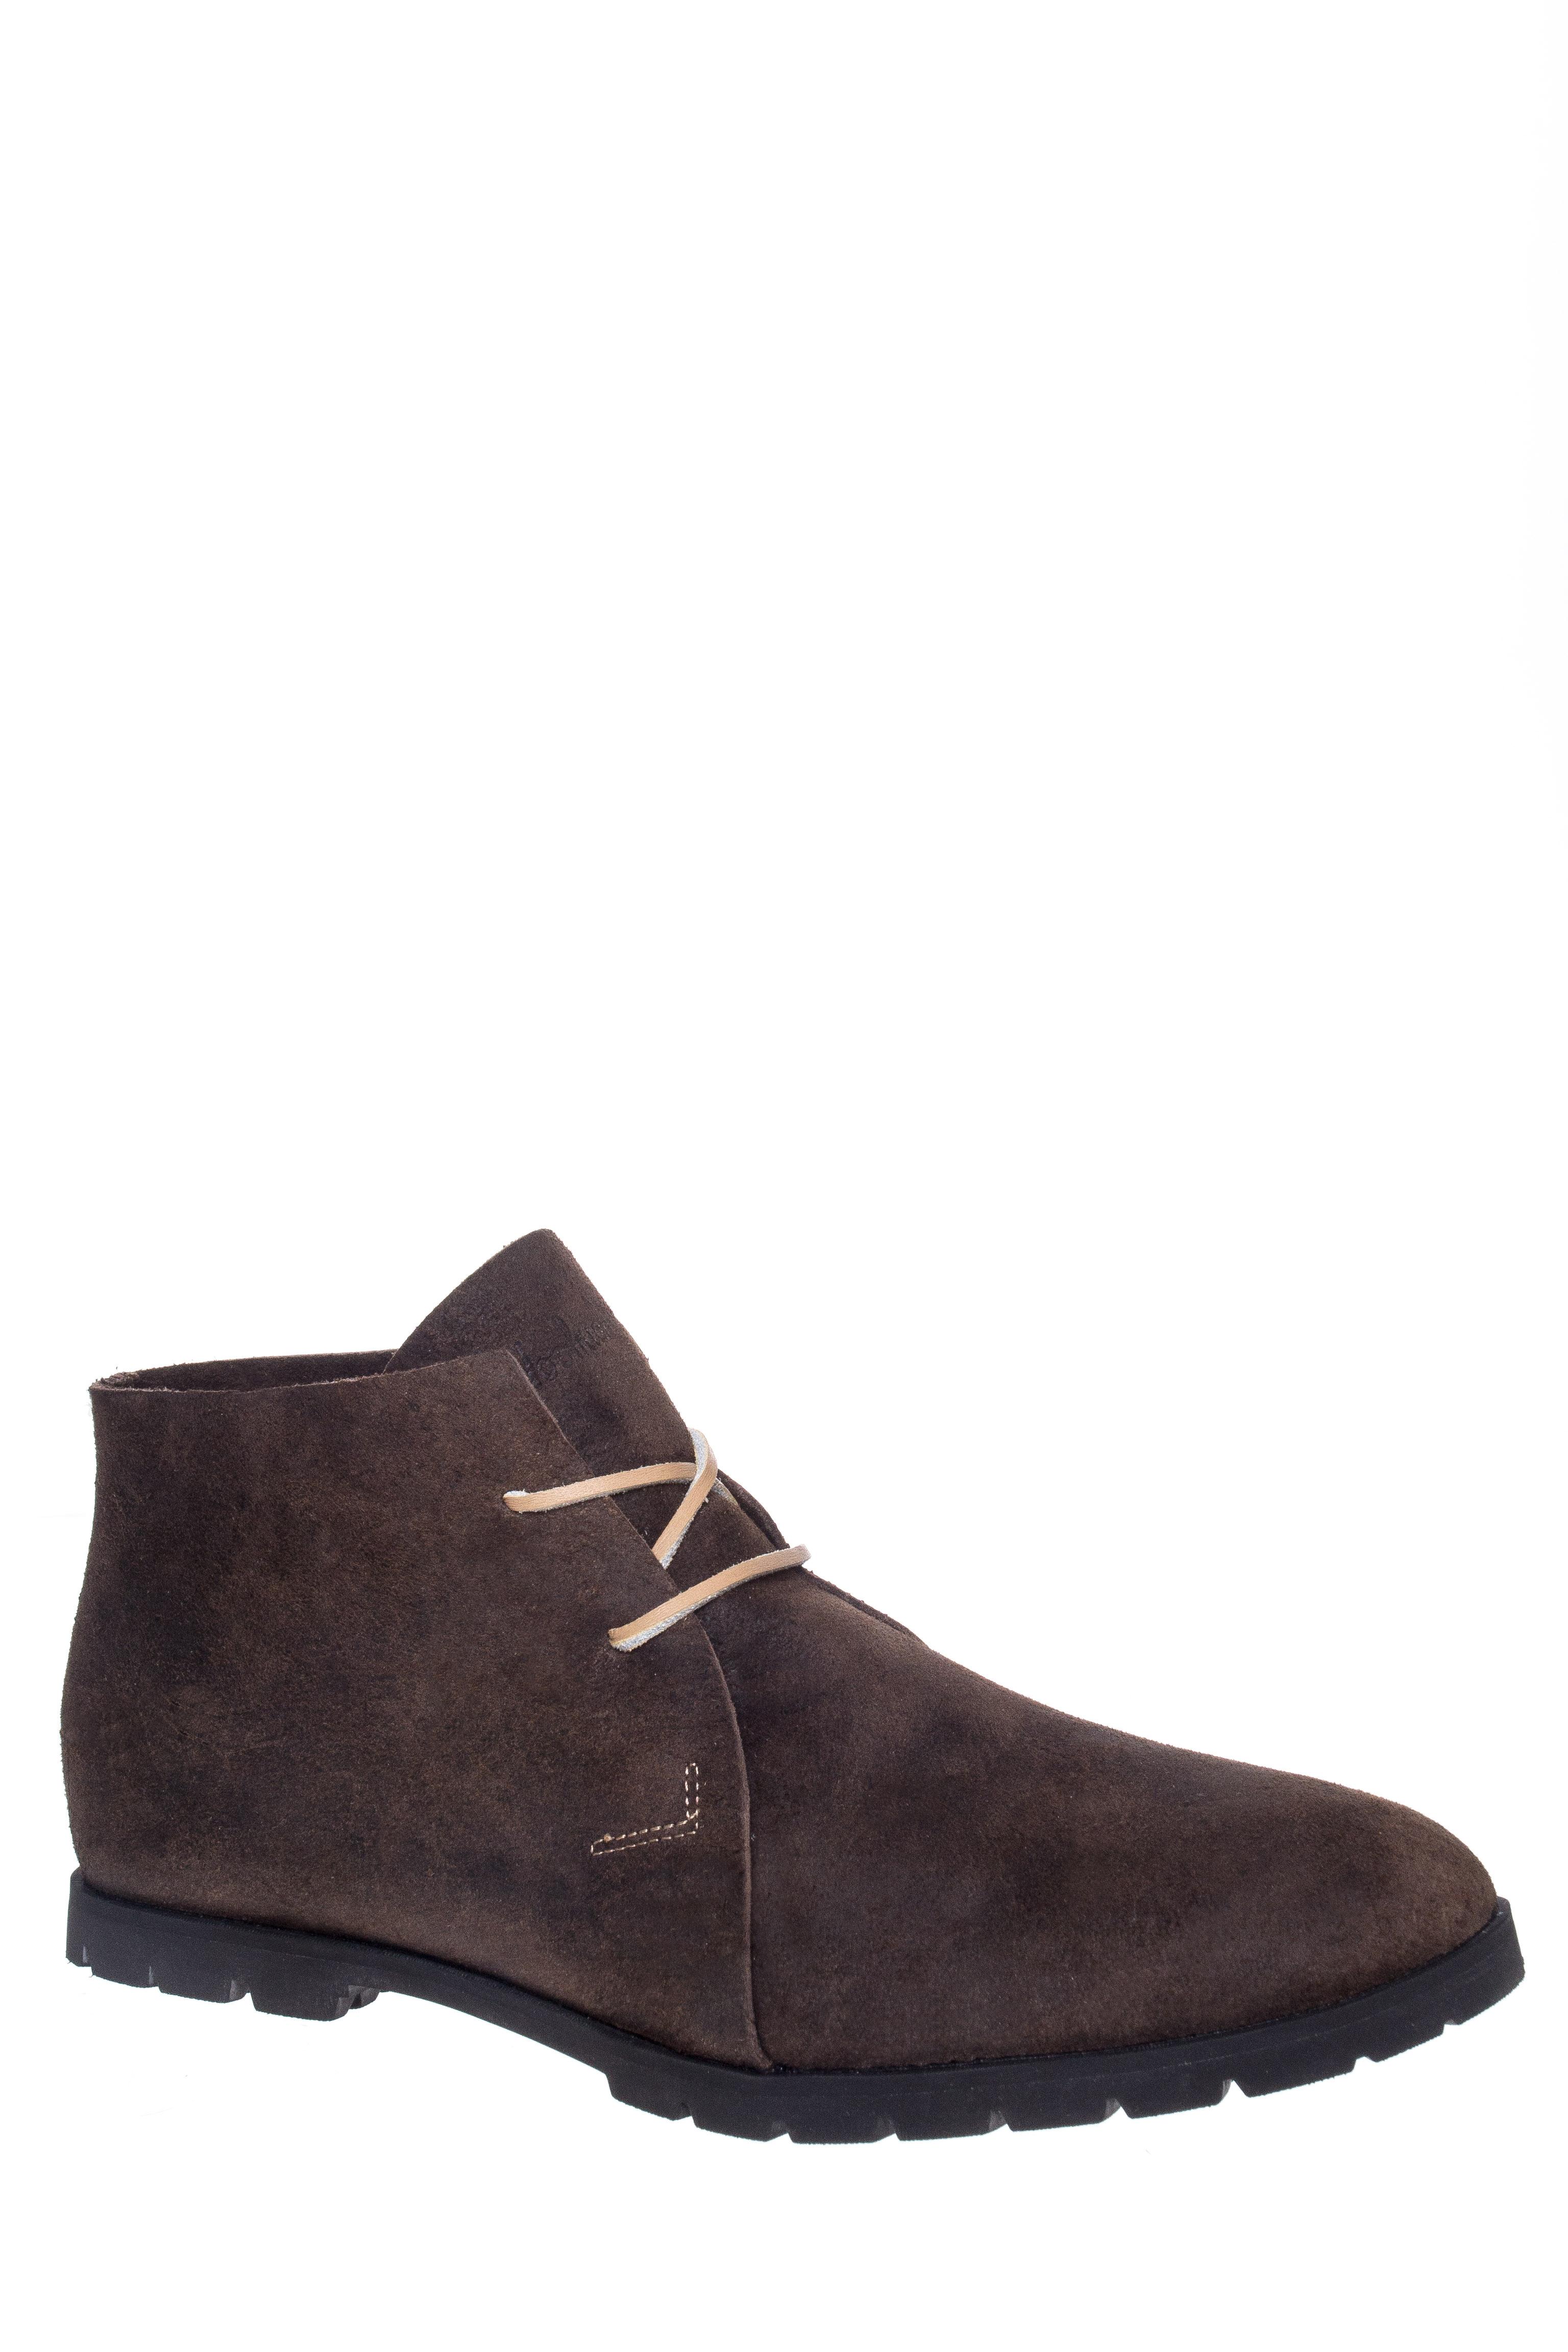 Men's Lane Chukka Boot